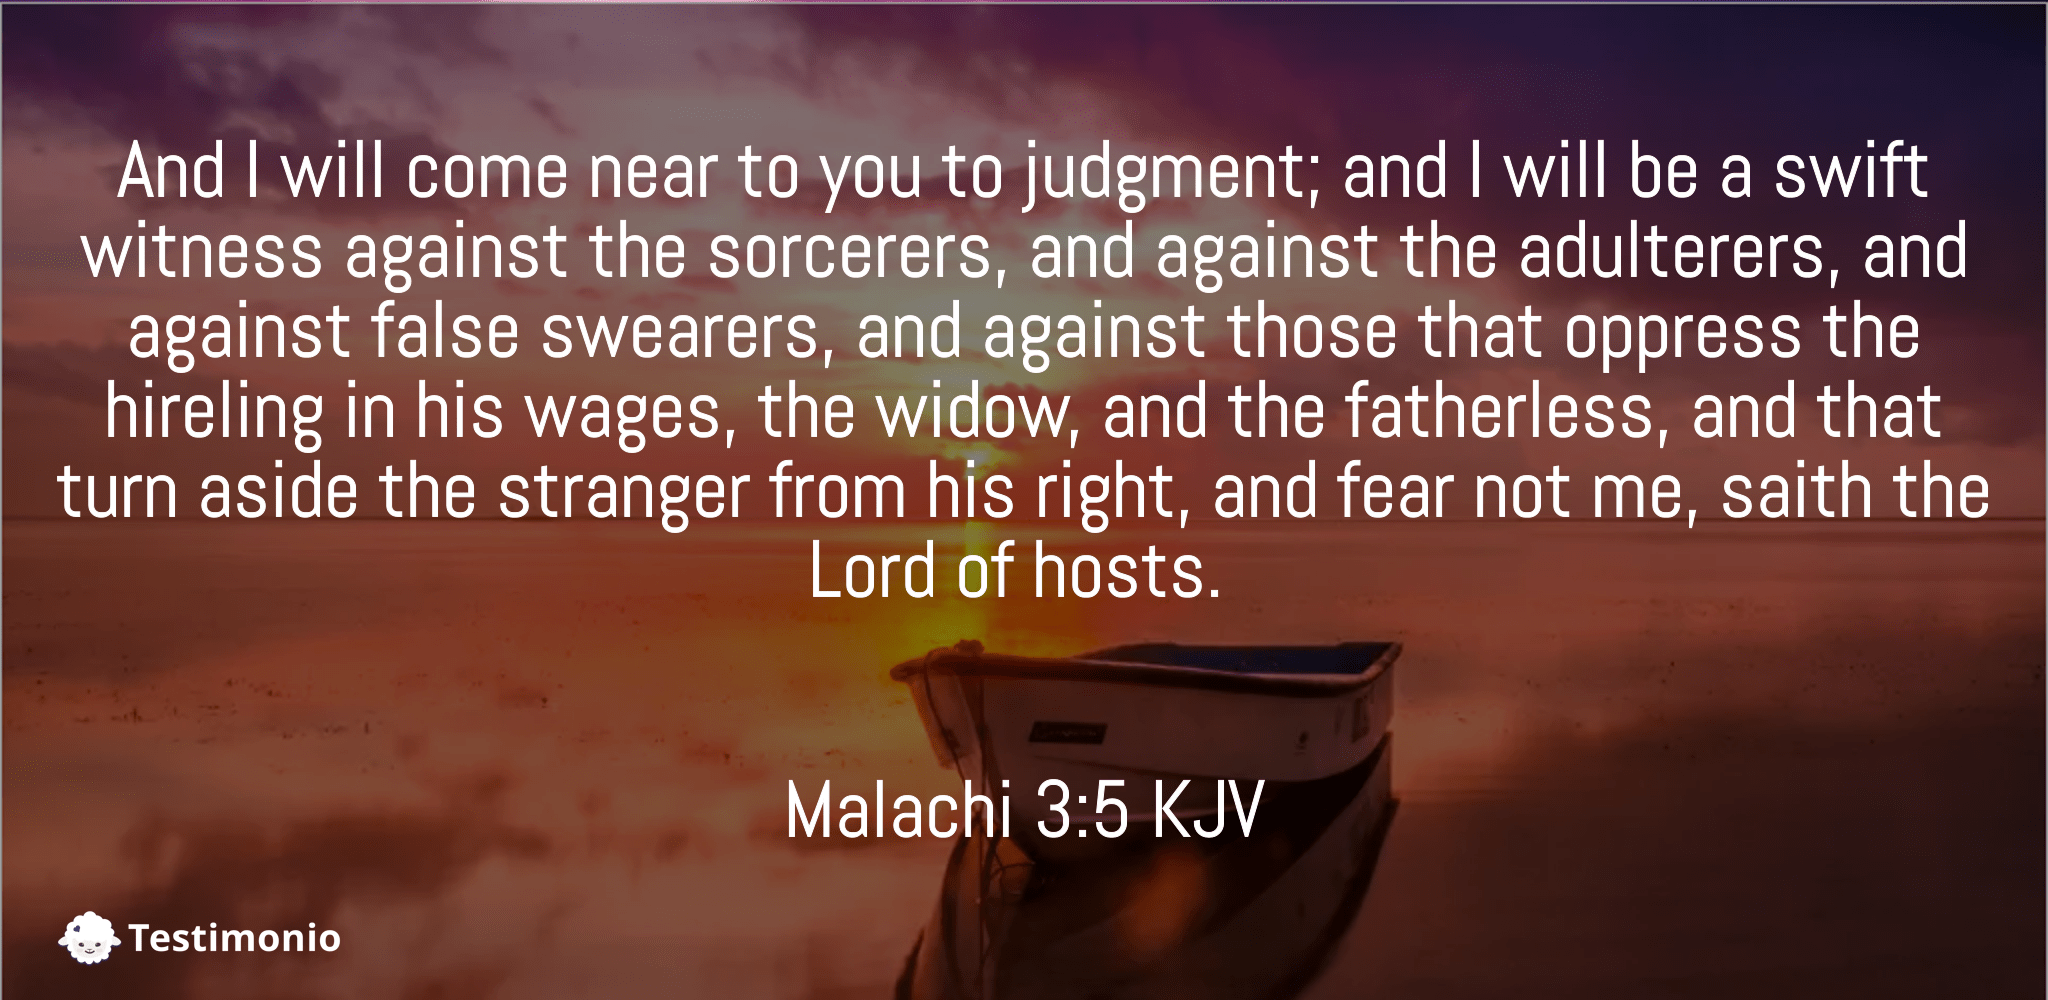 Malachi 3:5